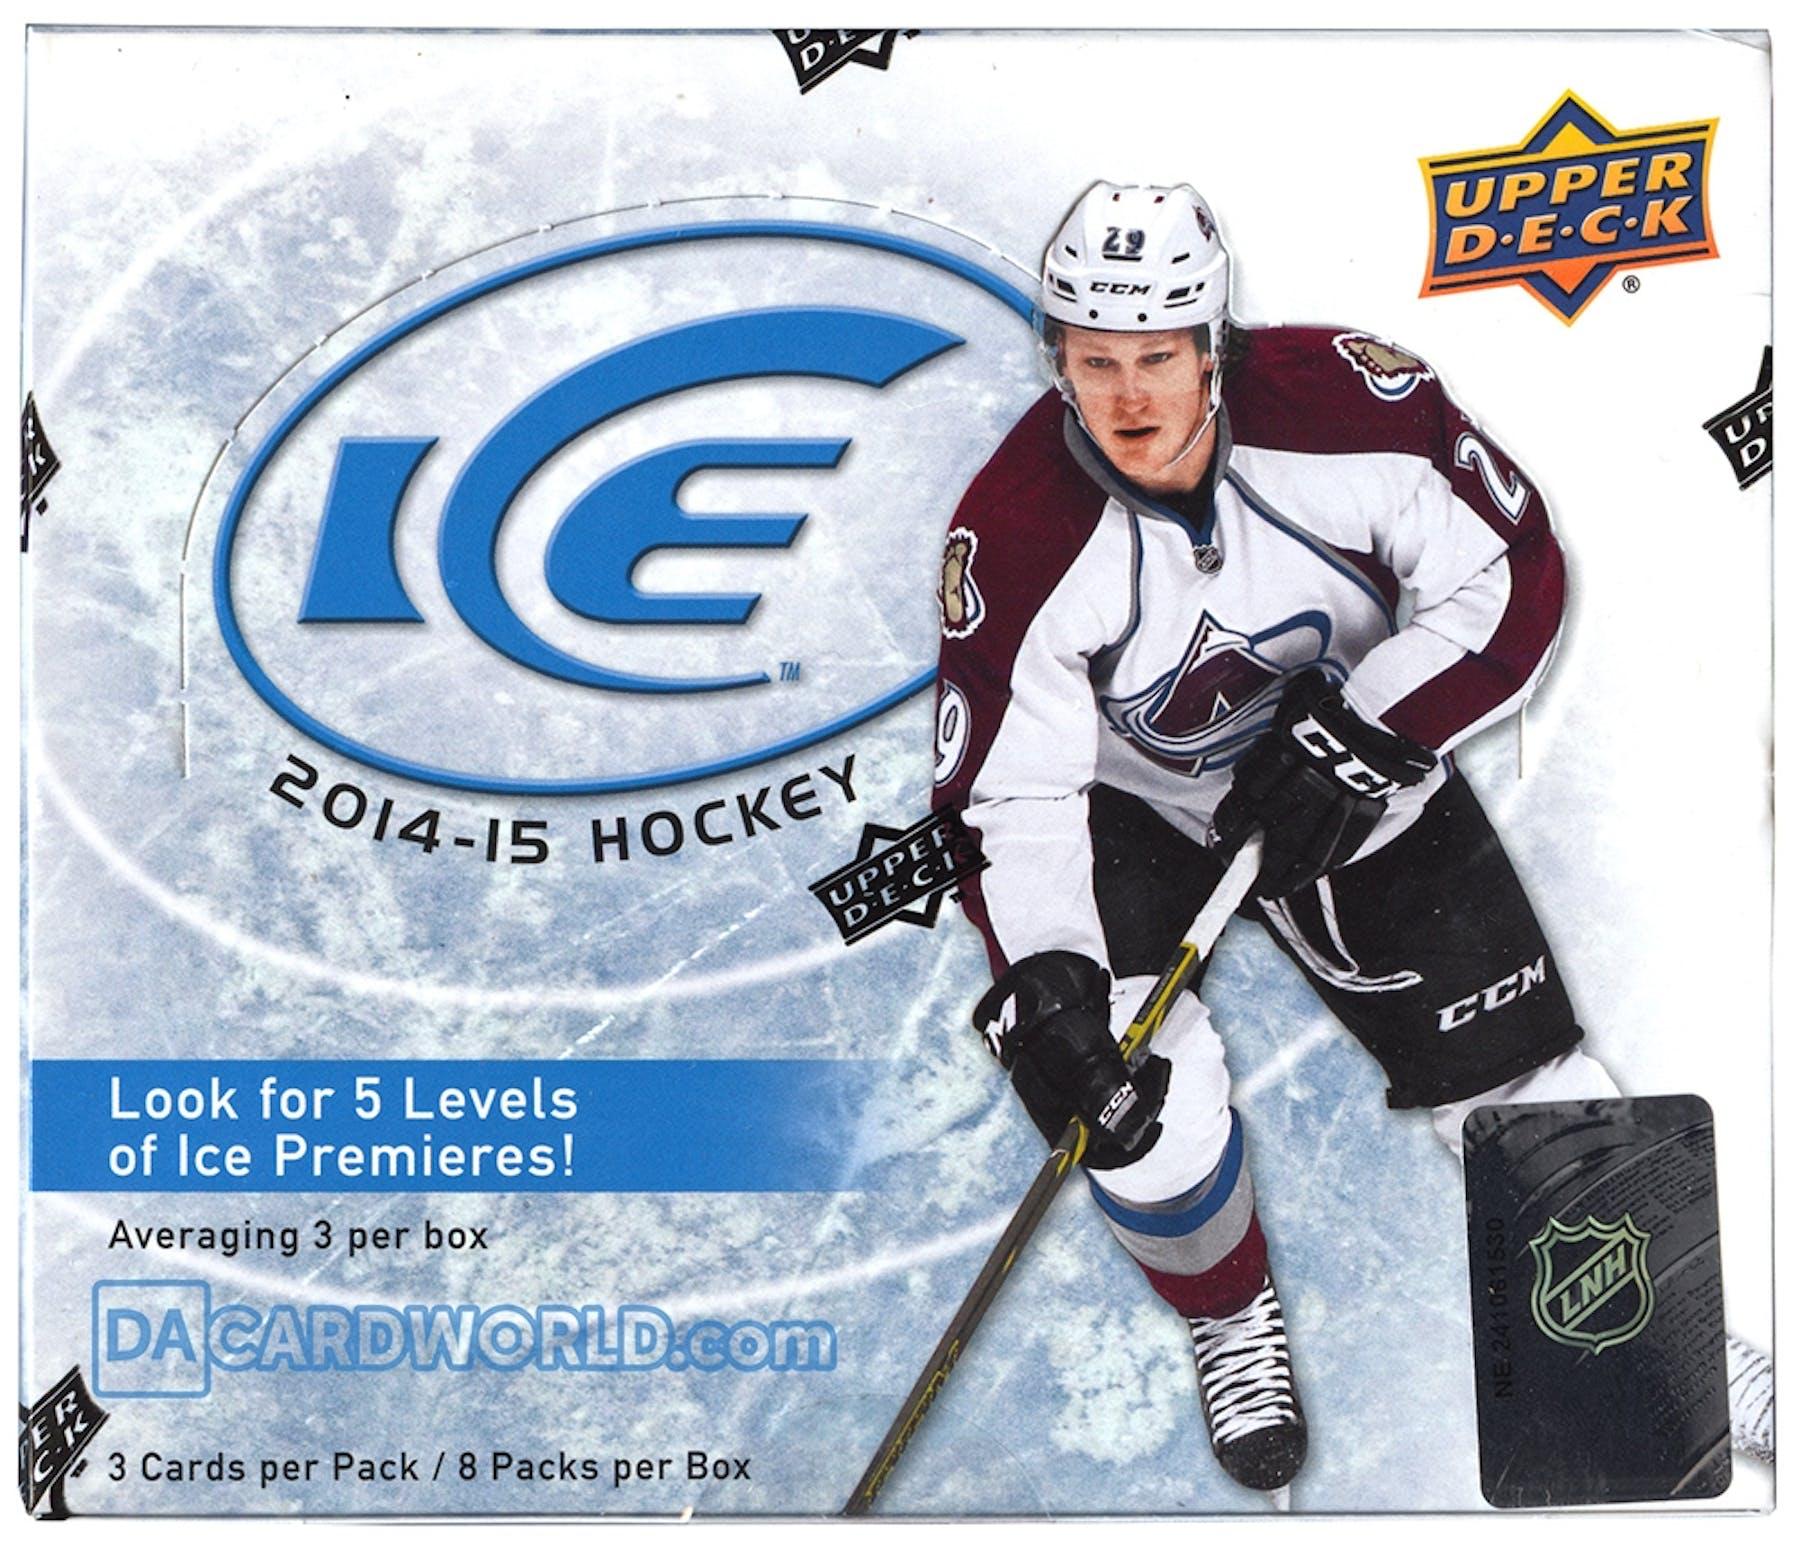 bc1c903134d 2014 15 Upper Deck Ice Hockey Hobby Box